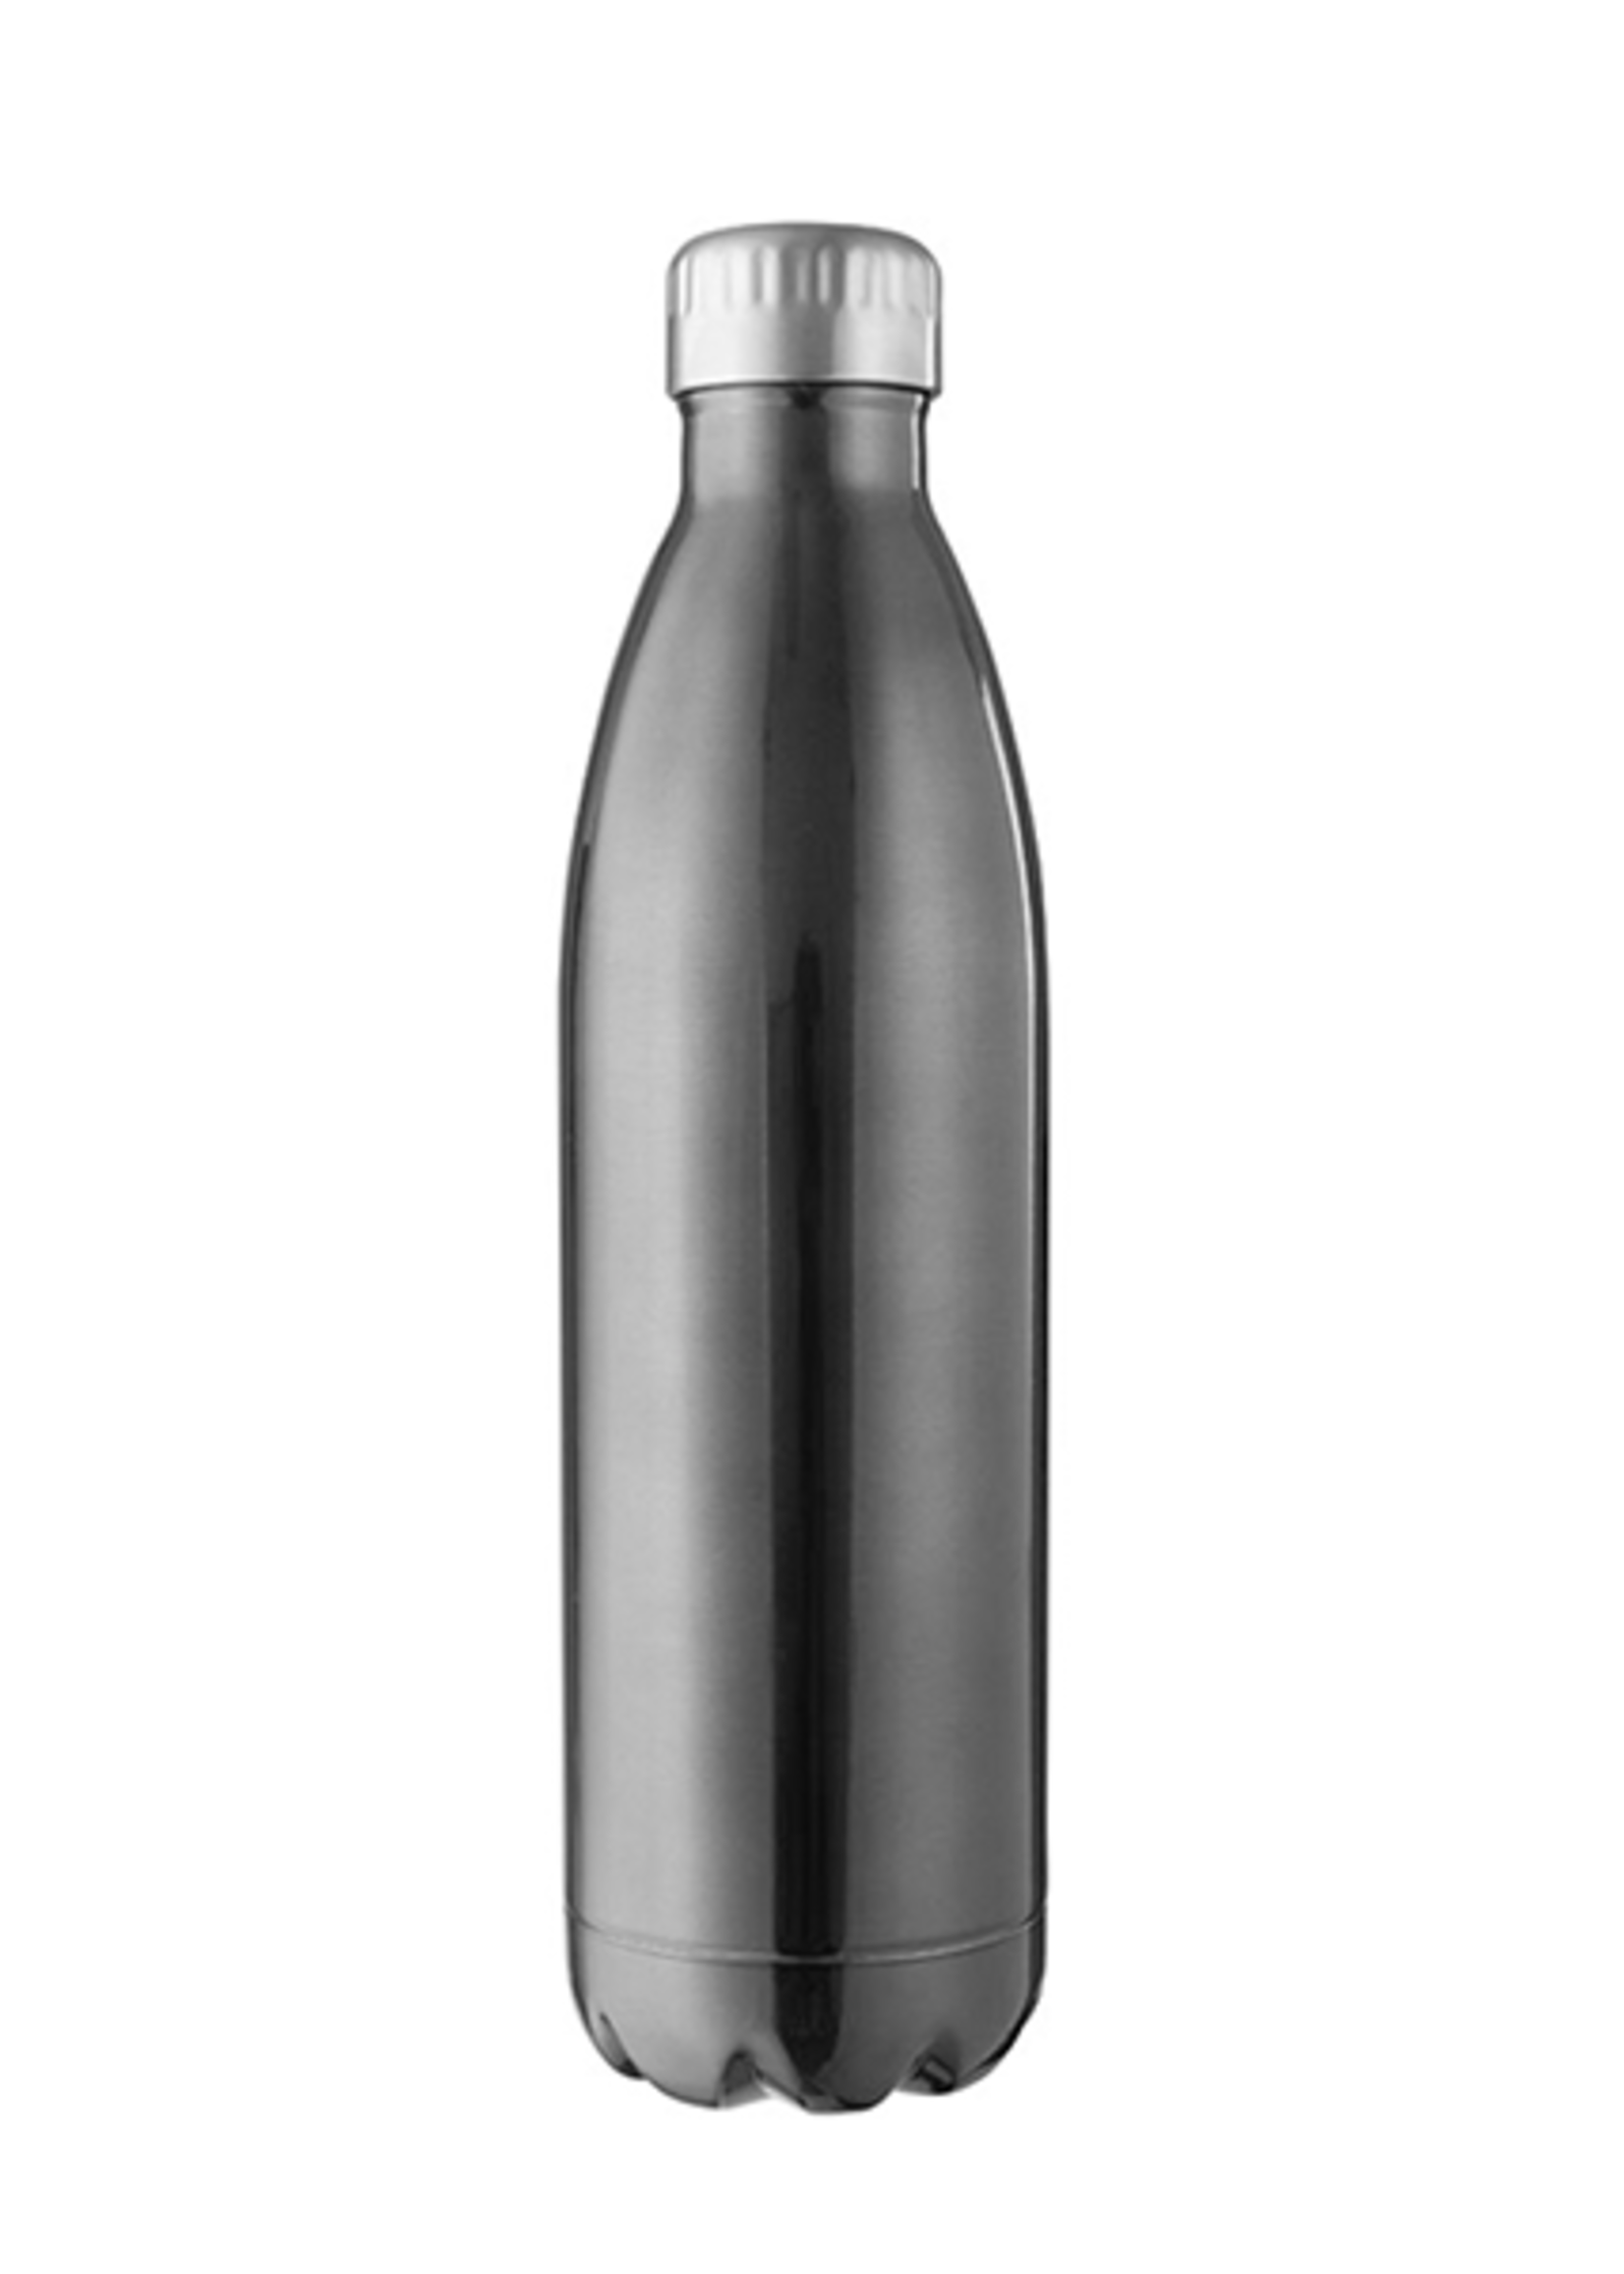 Avanti Homewares Fluid Bottle 500ml - Gunmetal